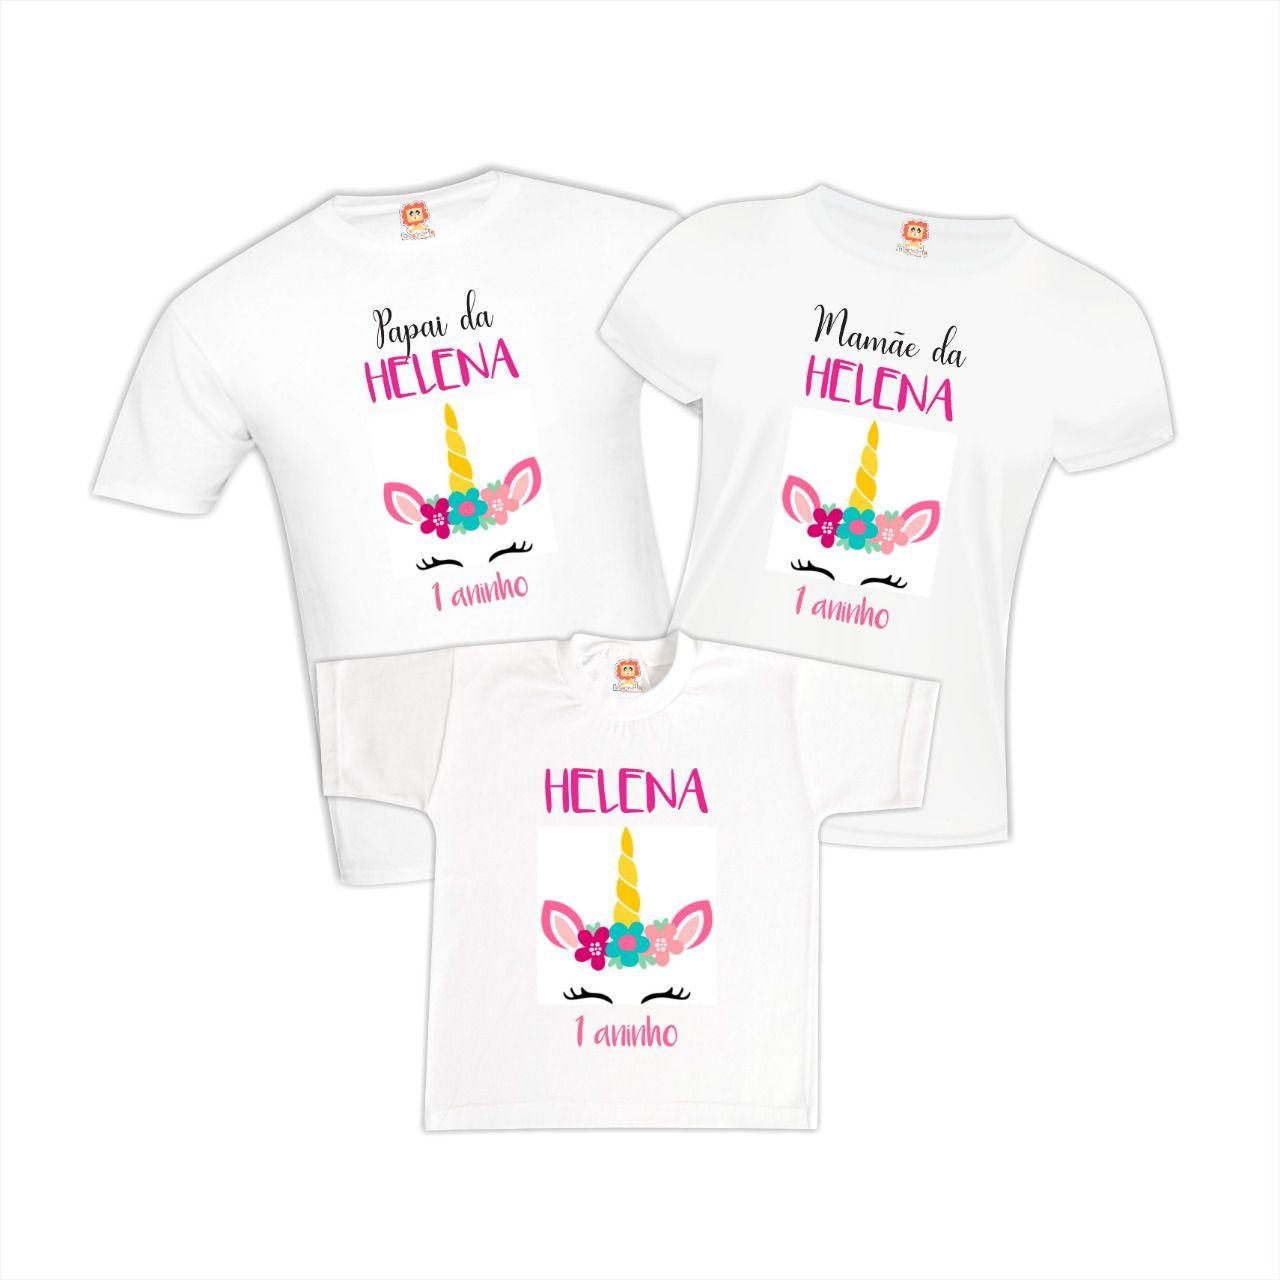 Camisetas de Aniversário Tema Unicórnio